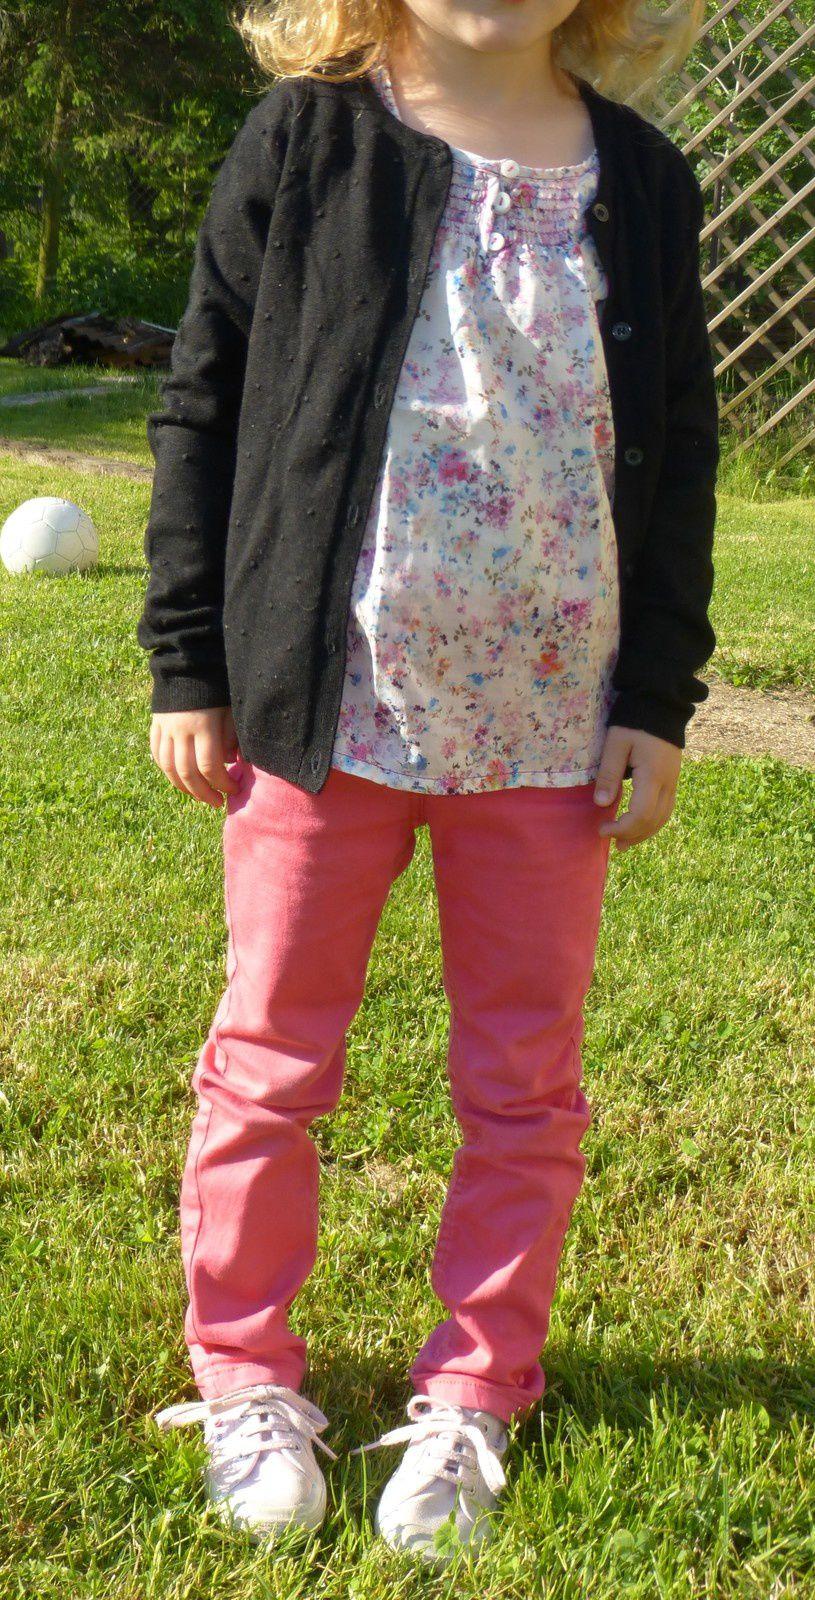 Blouse fleurie Zara Kids, pantalon rose Tape à l'oeil, gilet noir Mango Kids, Baskets rose Superga.